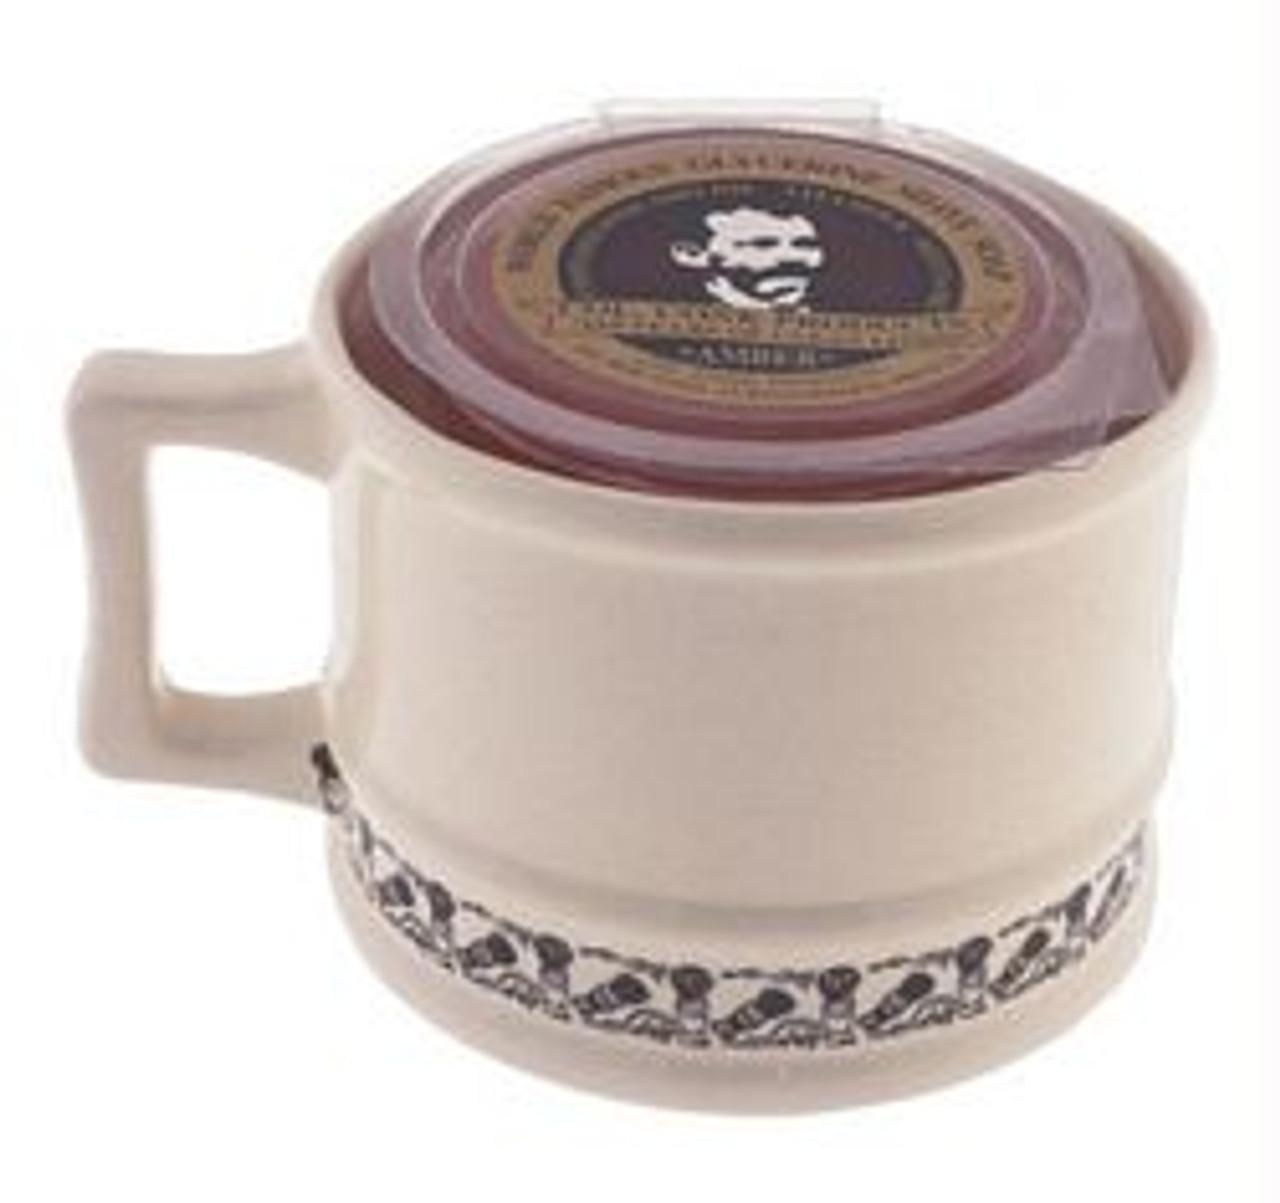 Col. Conk Shave Mug - SHAVING MUG #129